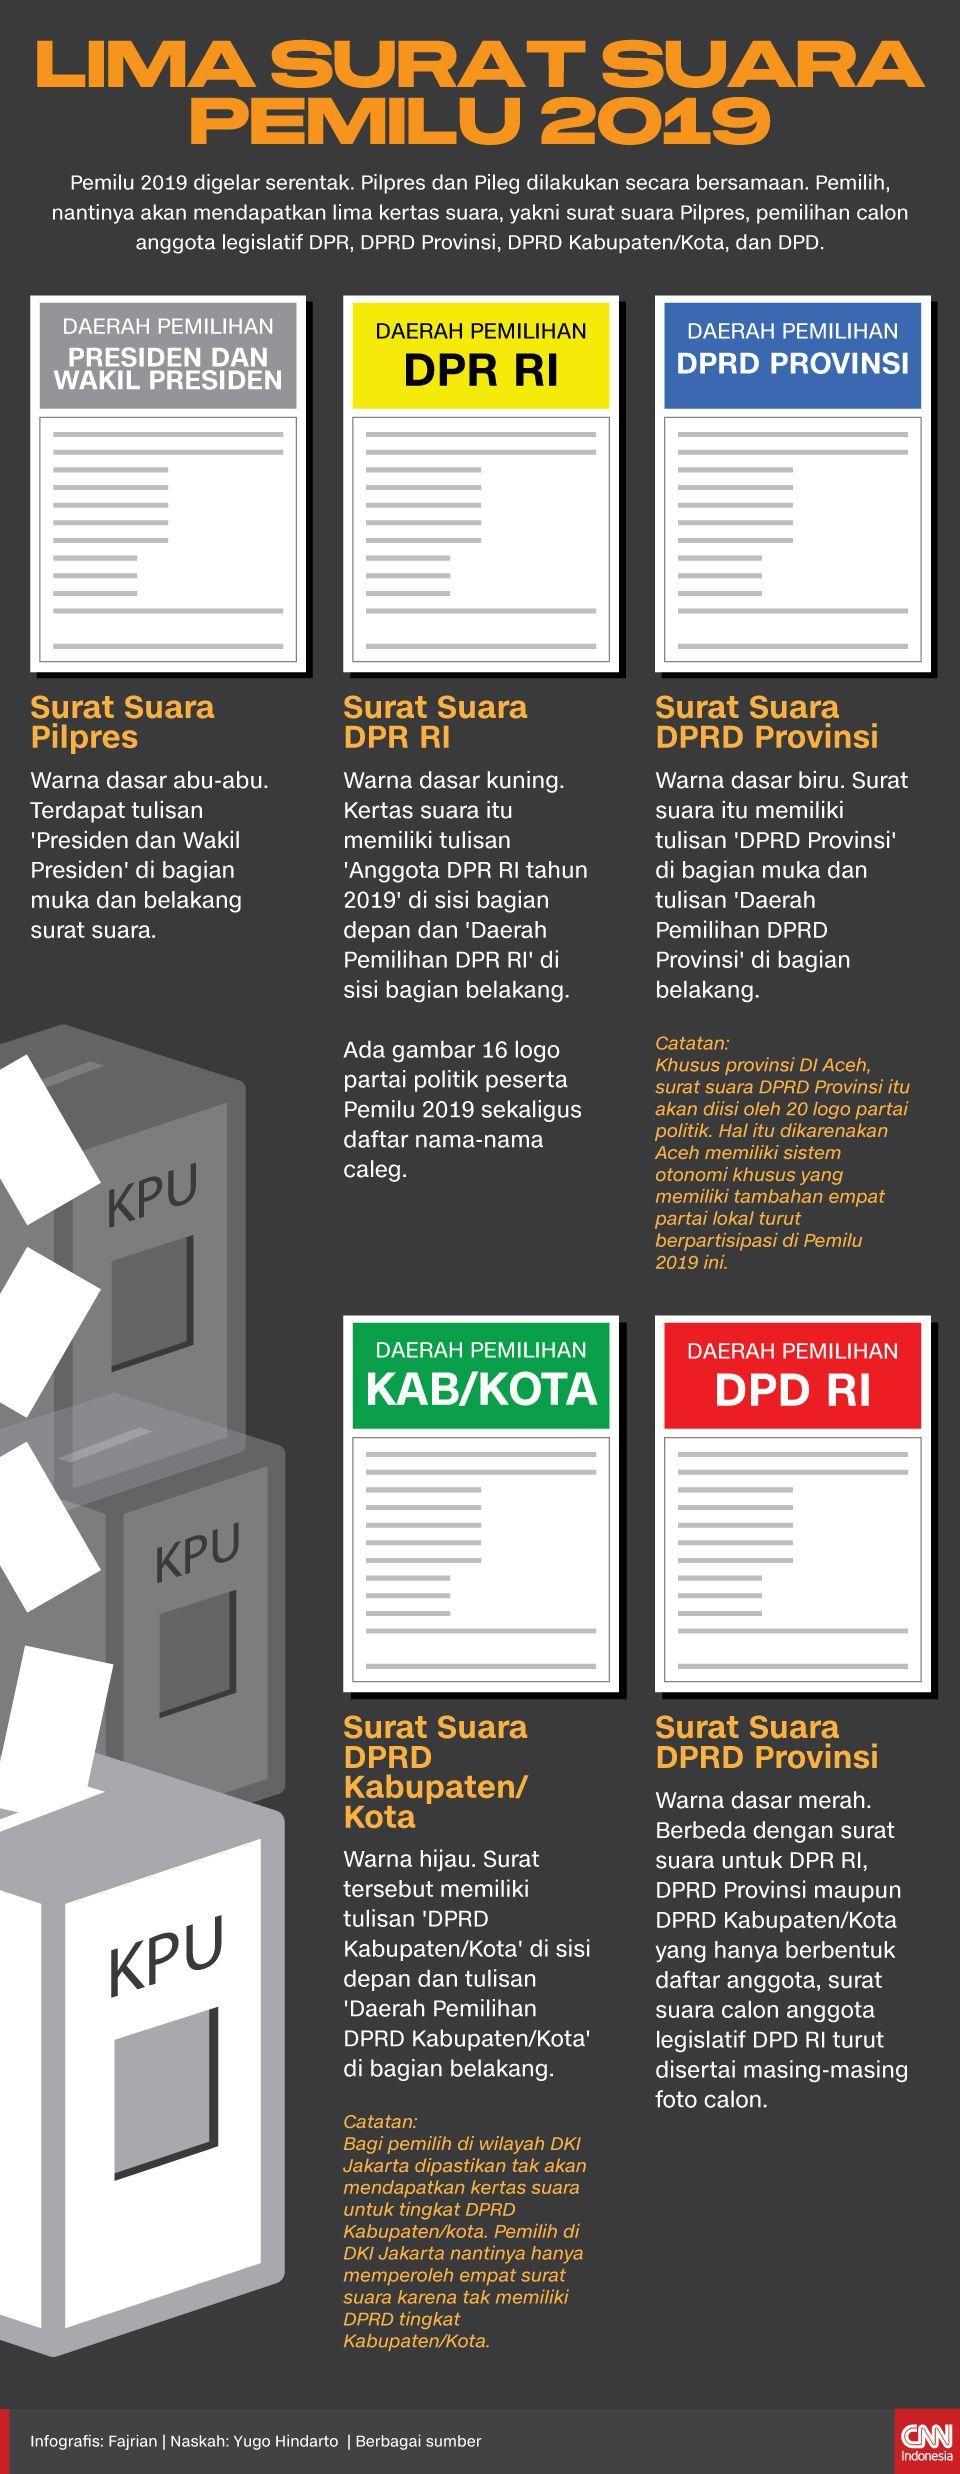 Infografis Lima Surat Suara Pemilu 2019